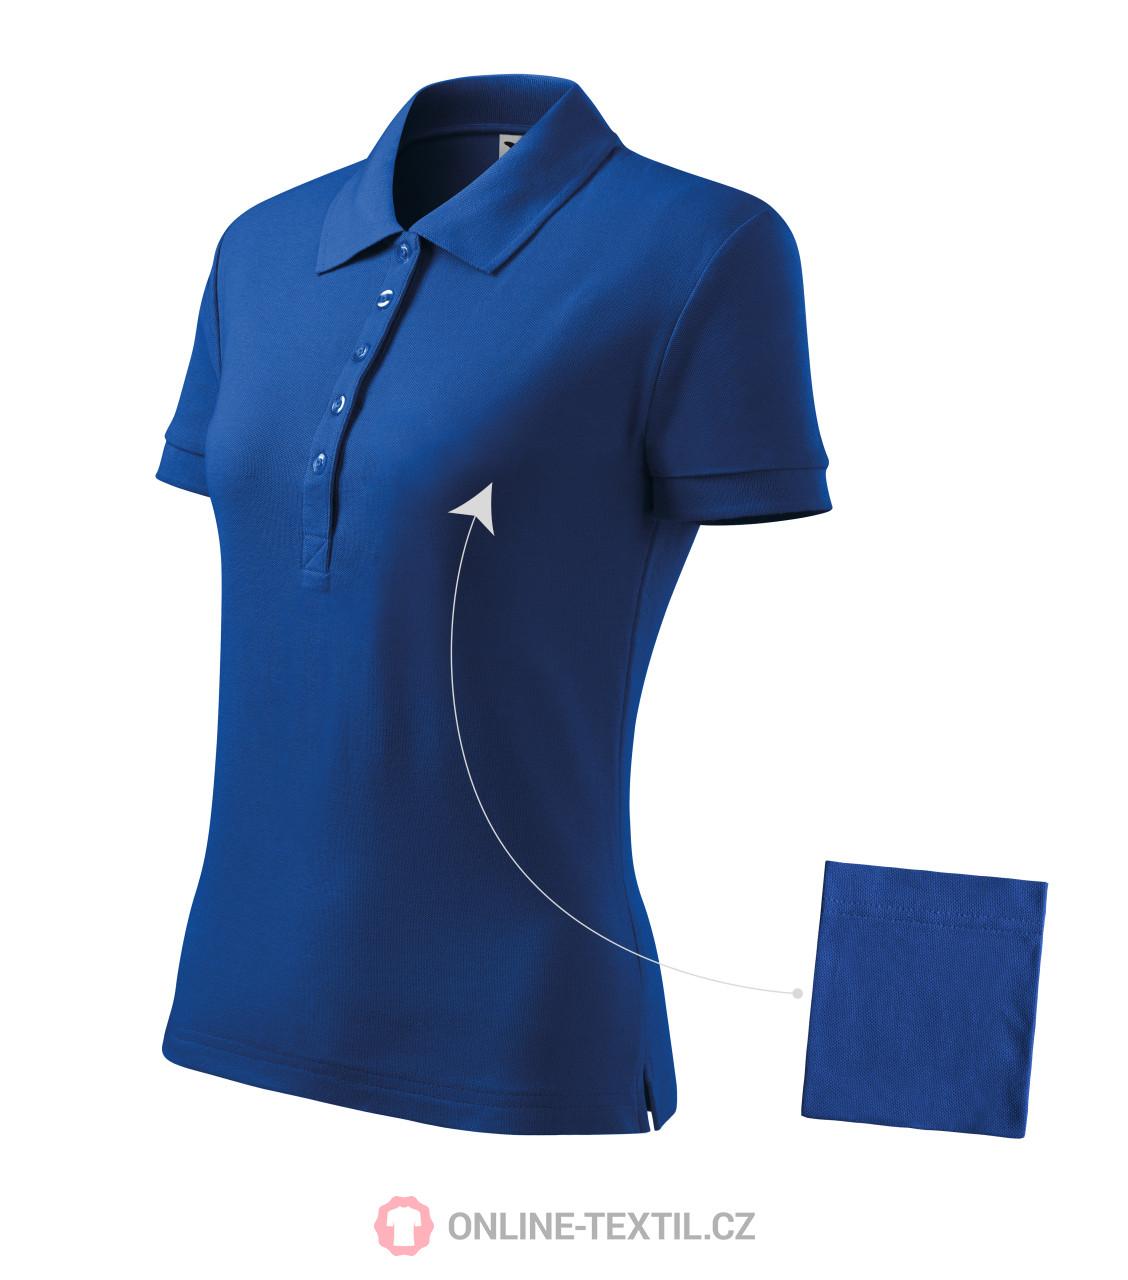 Lady-Fit Premium Poloshirt L 14,Royal Blue